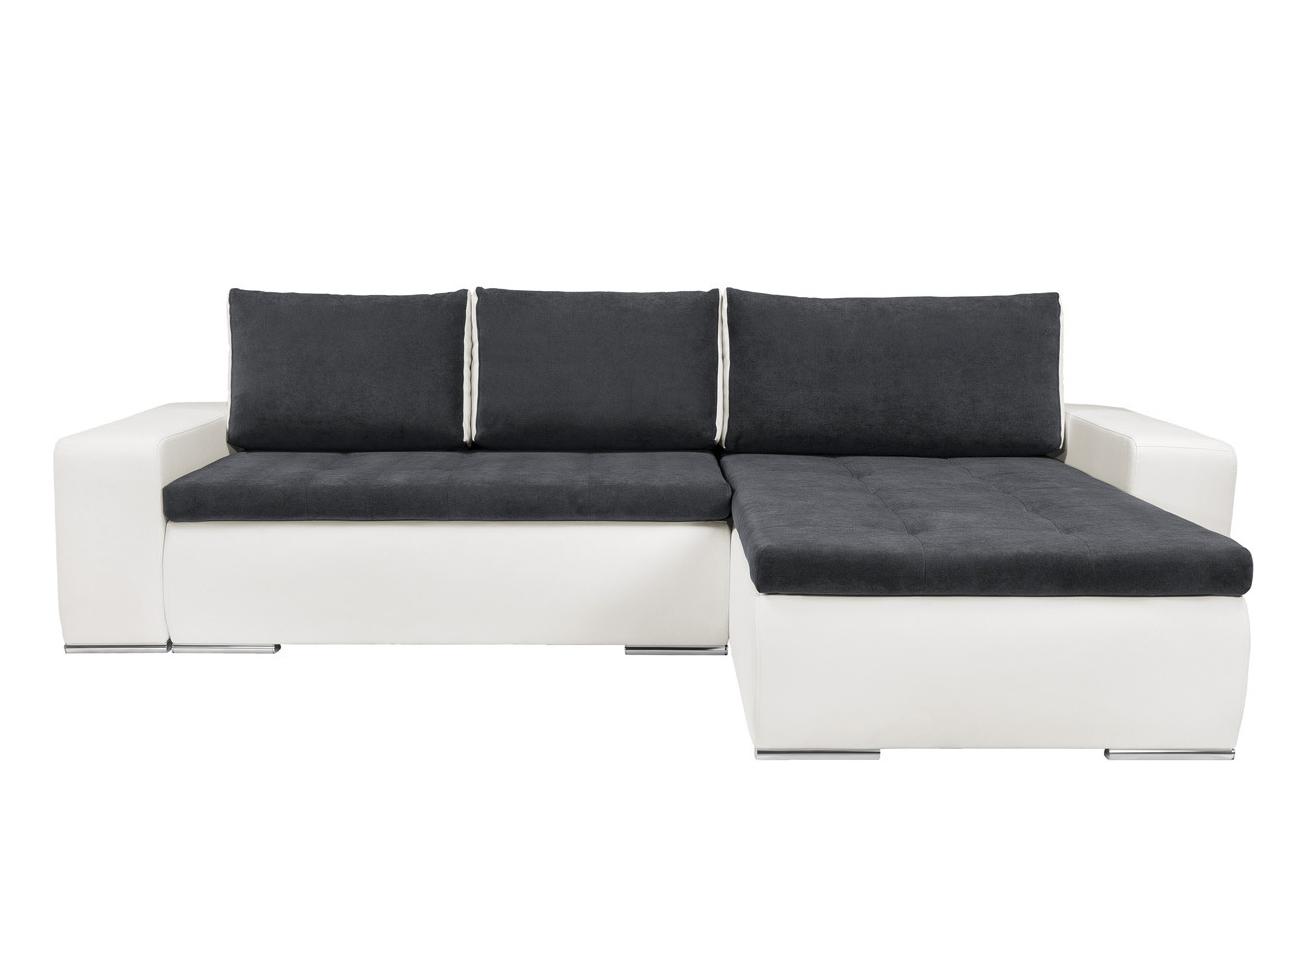 Rohová sedací souprava - BRW - Marina II Lux 3DL.URC bílá/modrošedá (P)